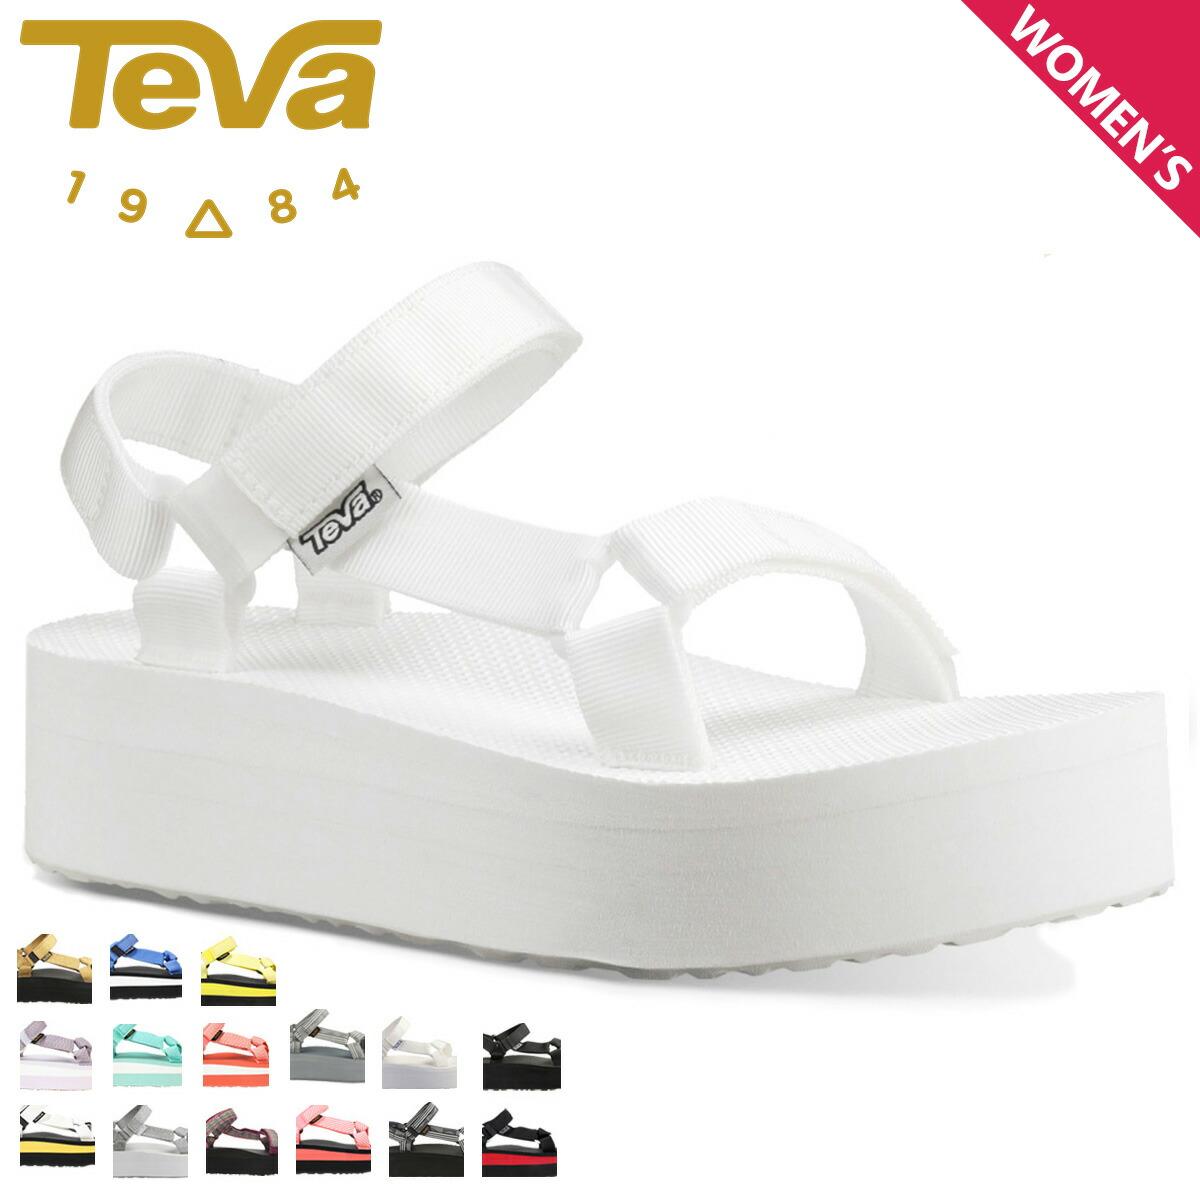 23935a89a49 Teva Teva sandals Lady s thickness bottom W FLATFORM UNIVERSAL flat form  universal 1008844